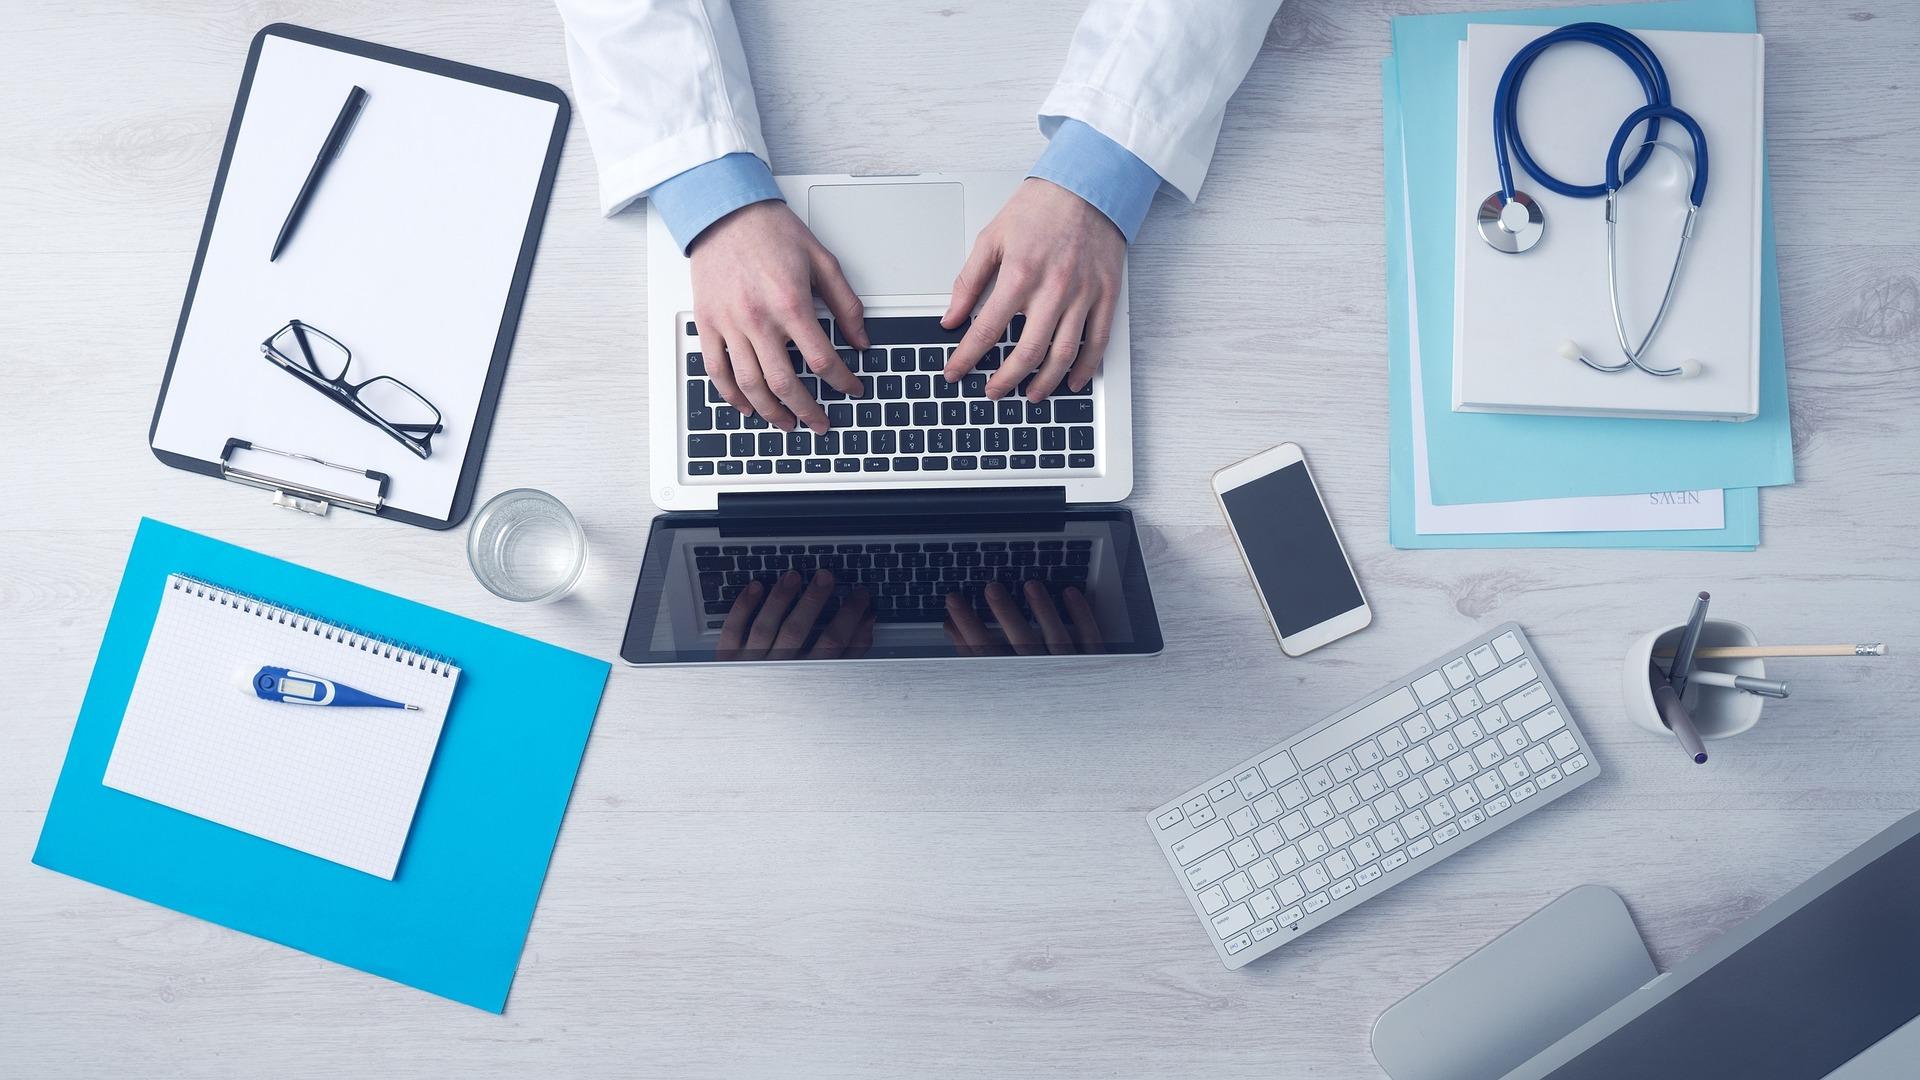 Waaw seo agence de référencement seo médicale en tunisie